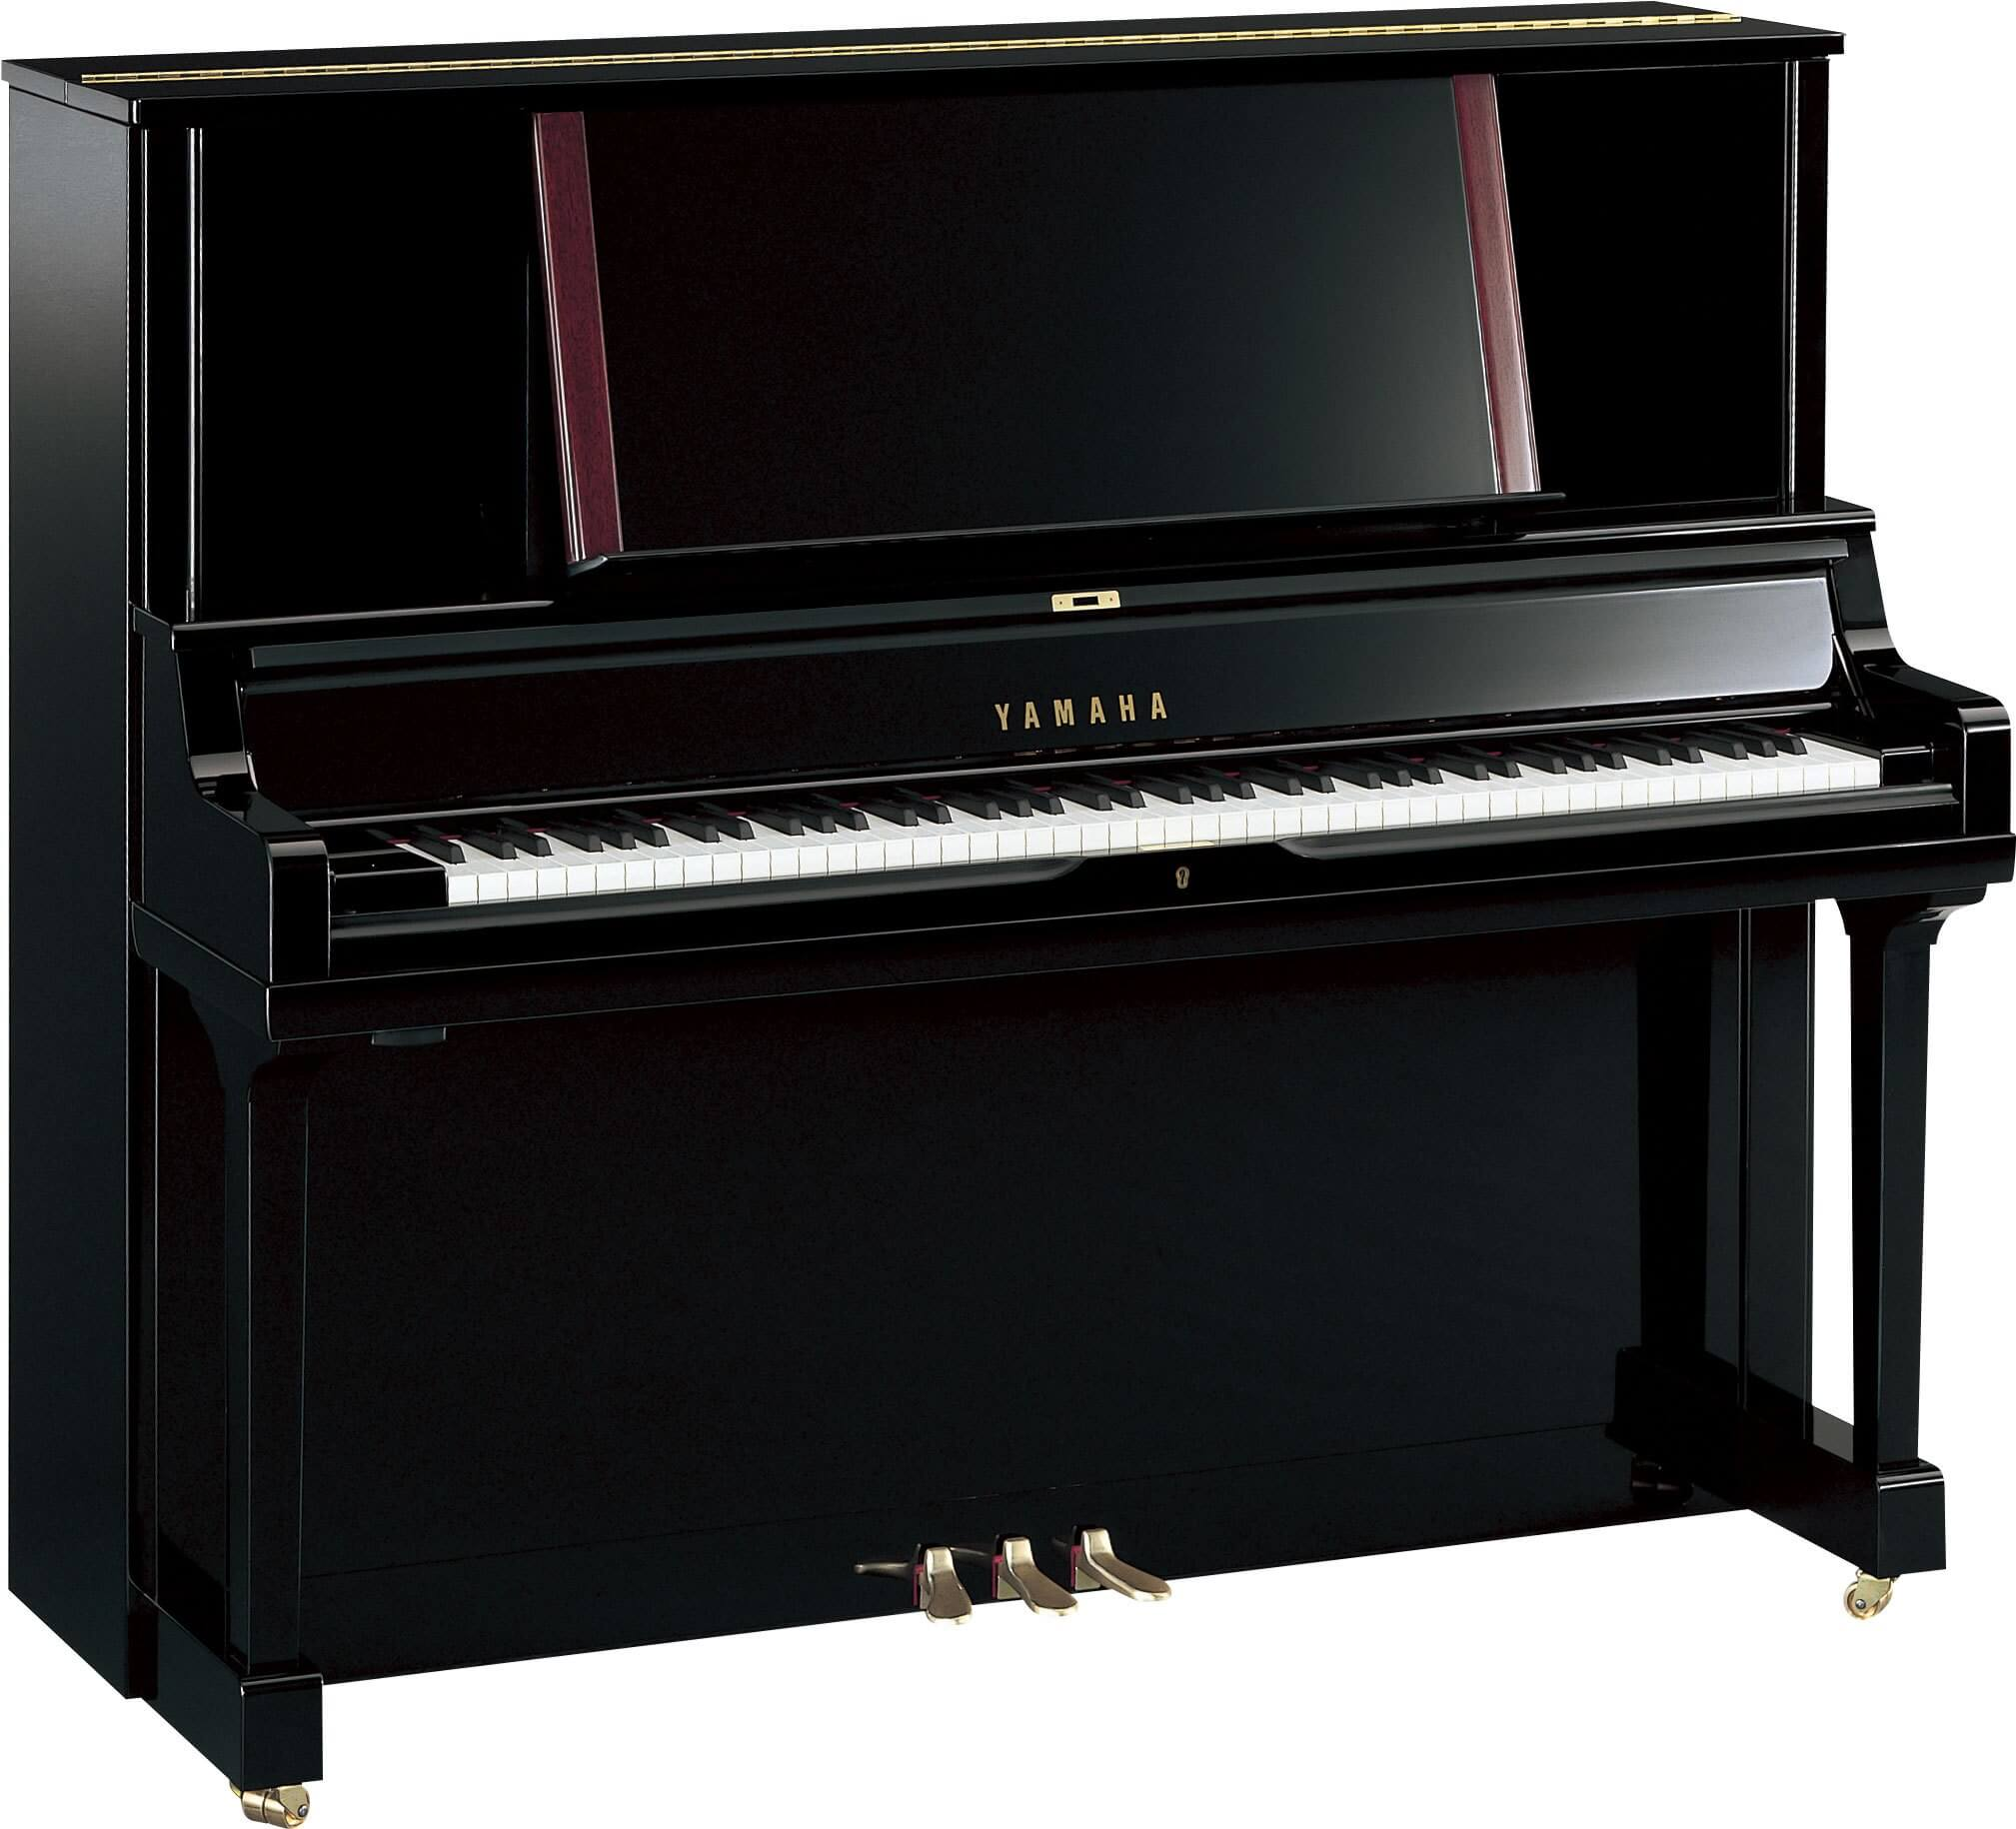 Piano Vertical Yamaha Yus5